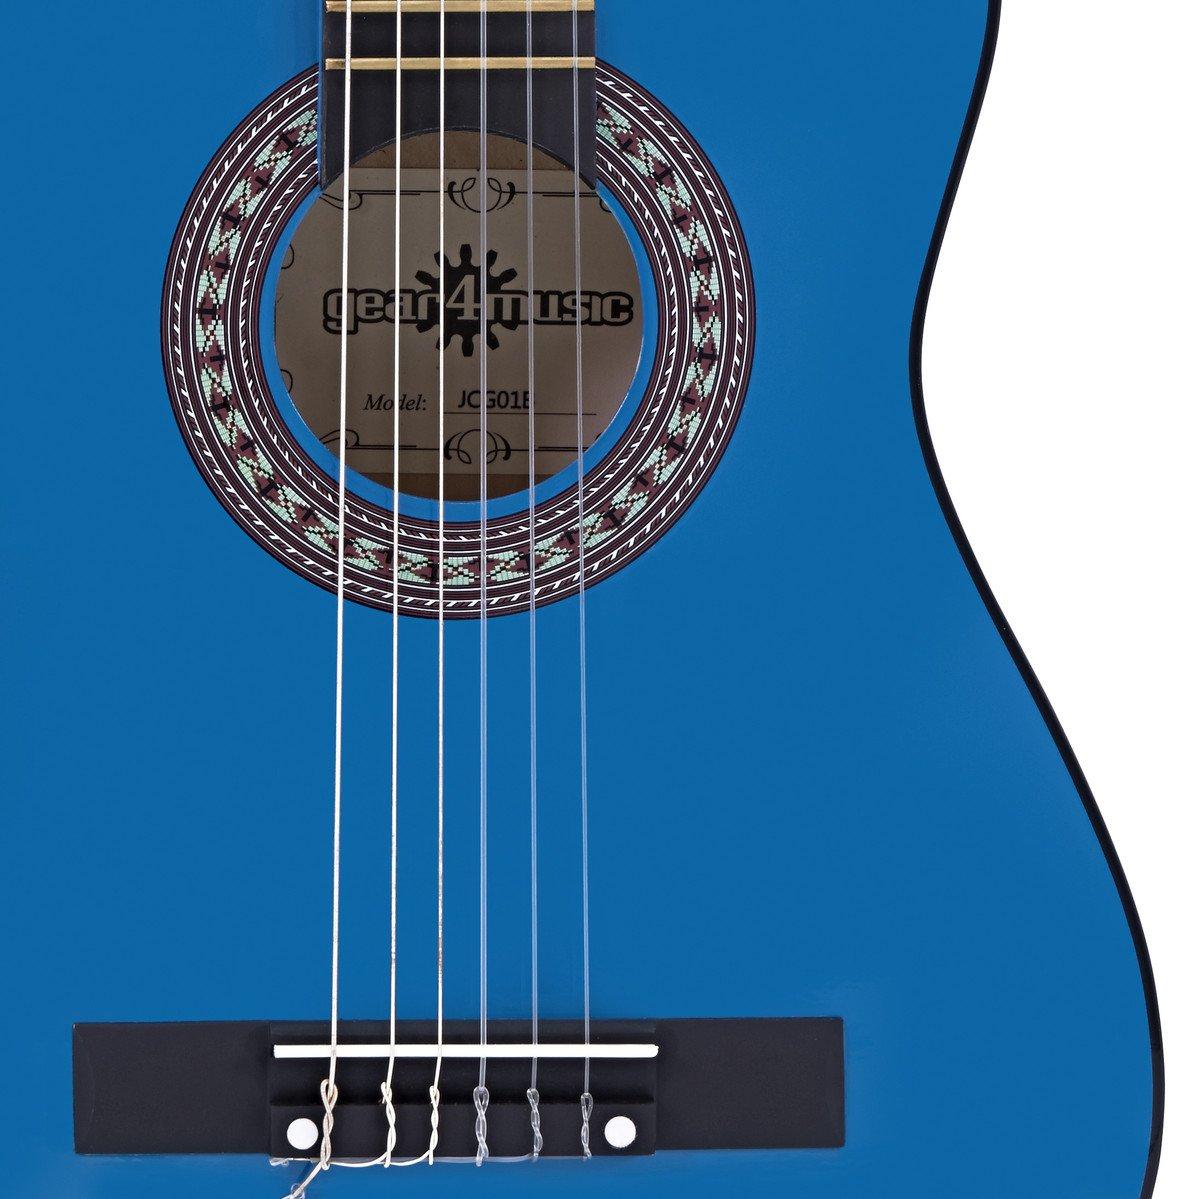 Funda de Guitarra Espa/ñola de 1//2 de Gear4music